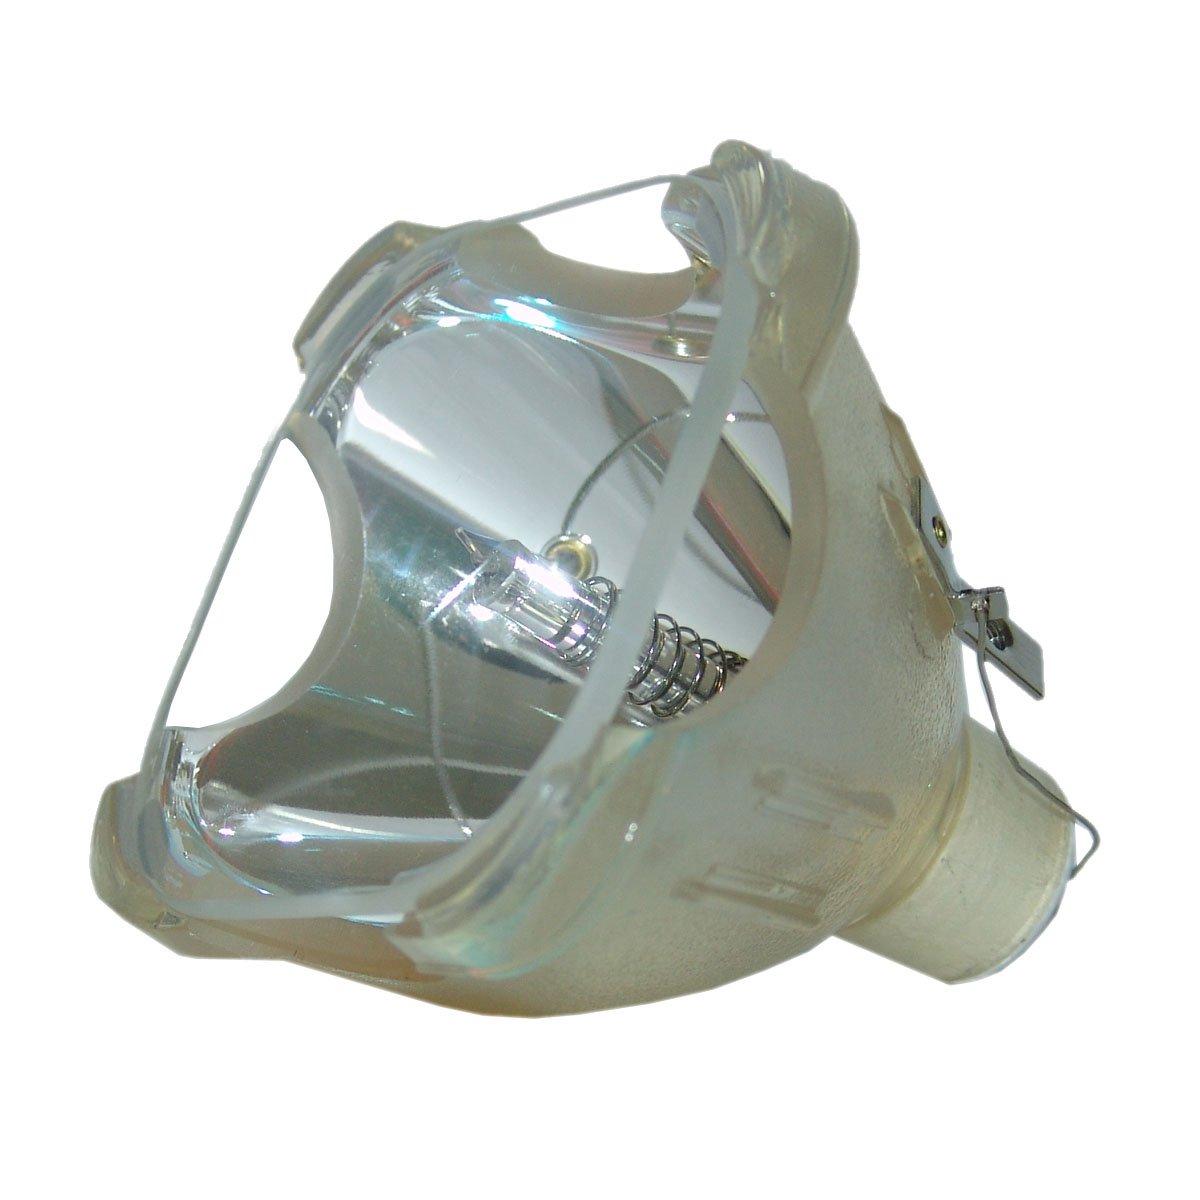 SpArc OEM交換用ランプ 囲い/電球付き Boxlight MP60E-930用 Economy Economy Lamp Only B07MJ3B45F